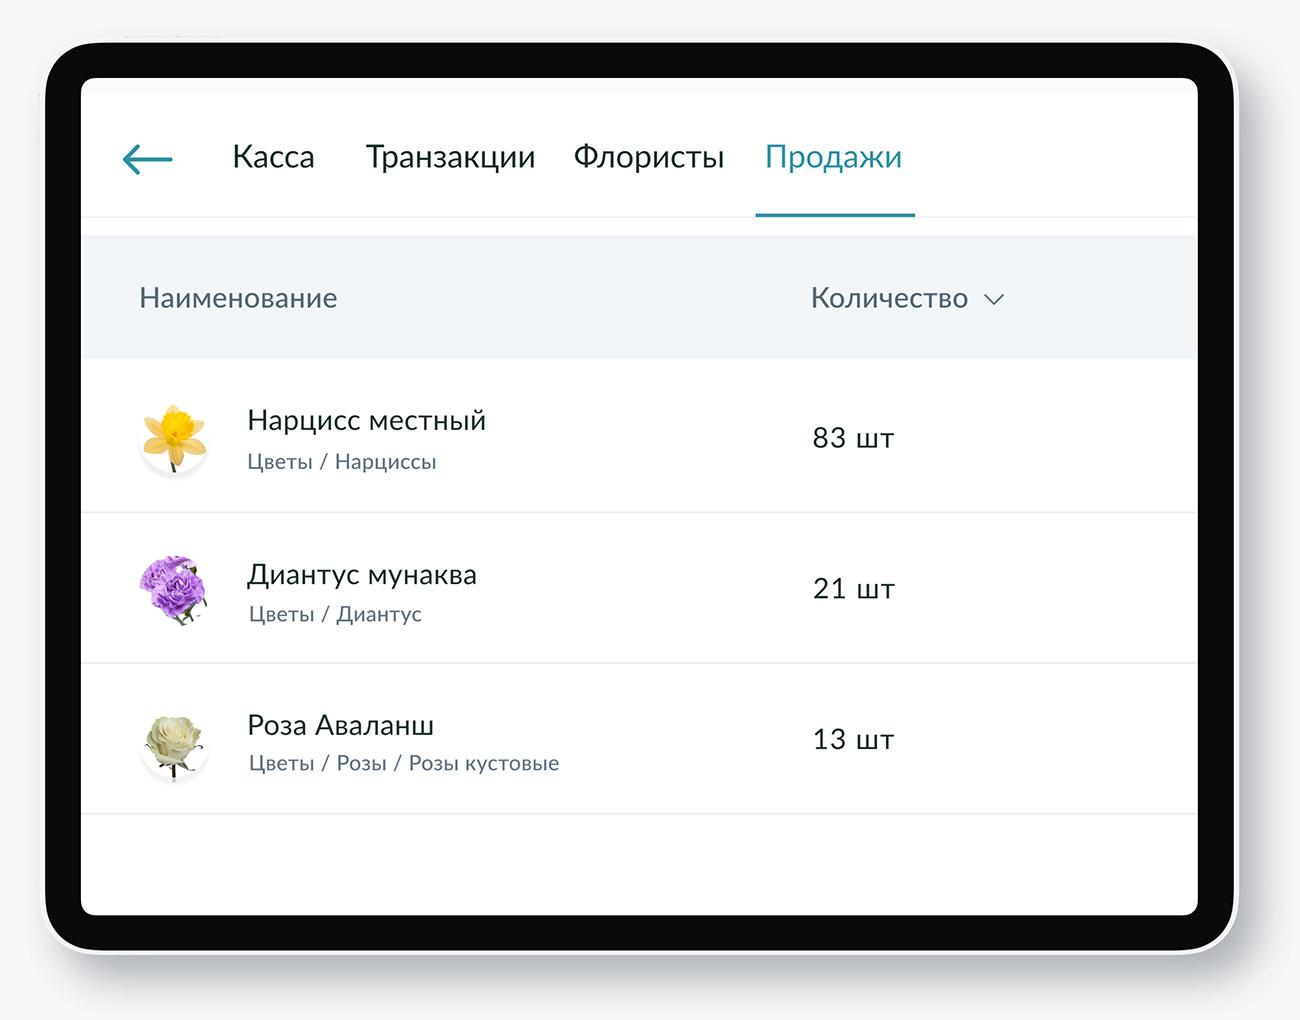 Скриншот интерфейса на планшете